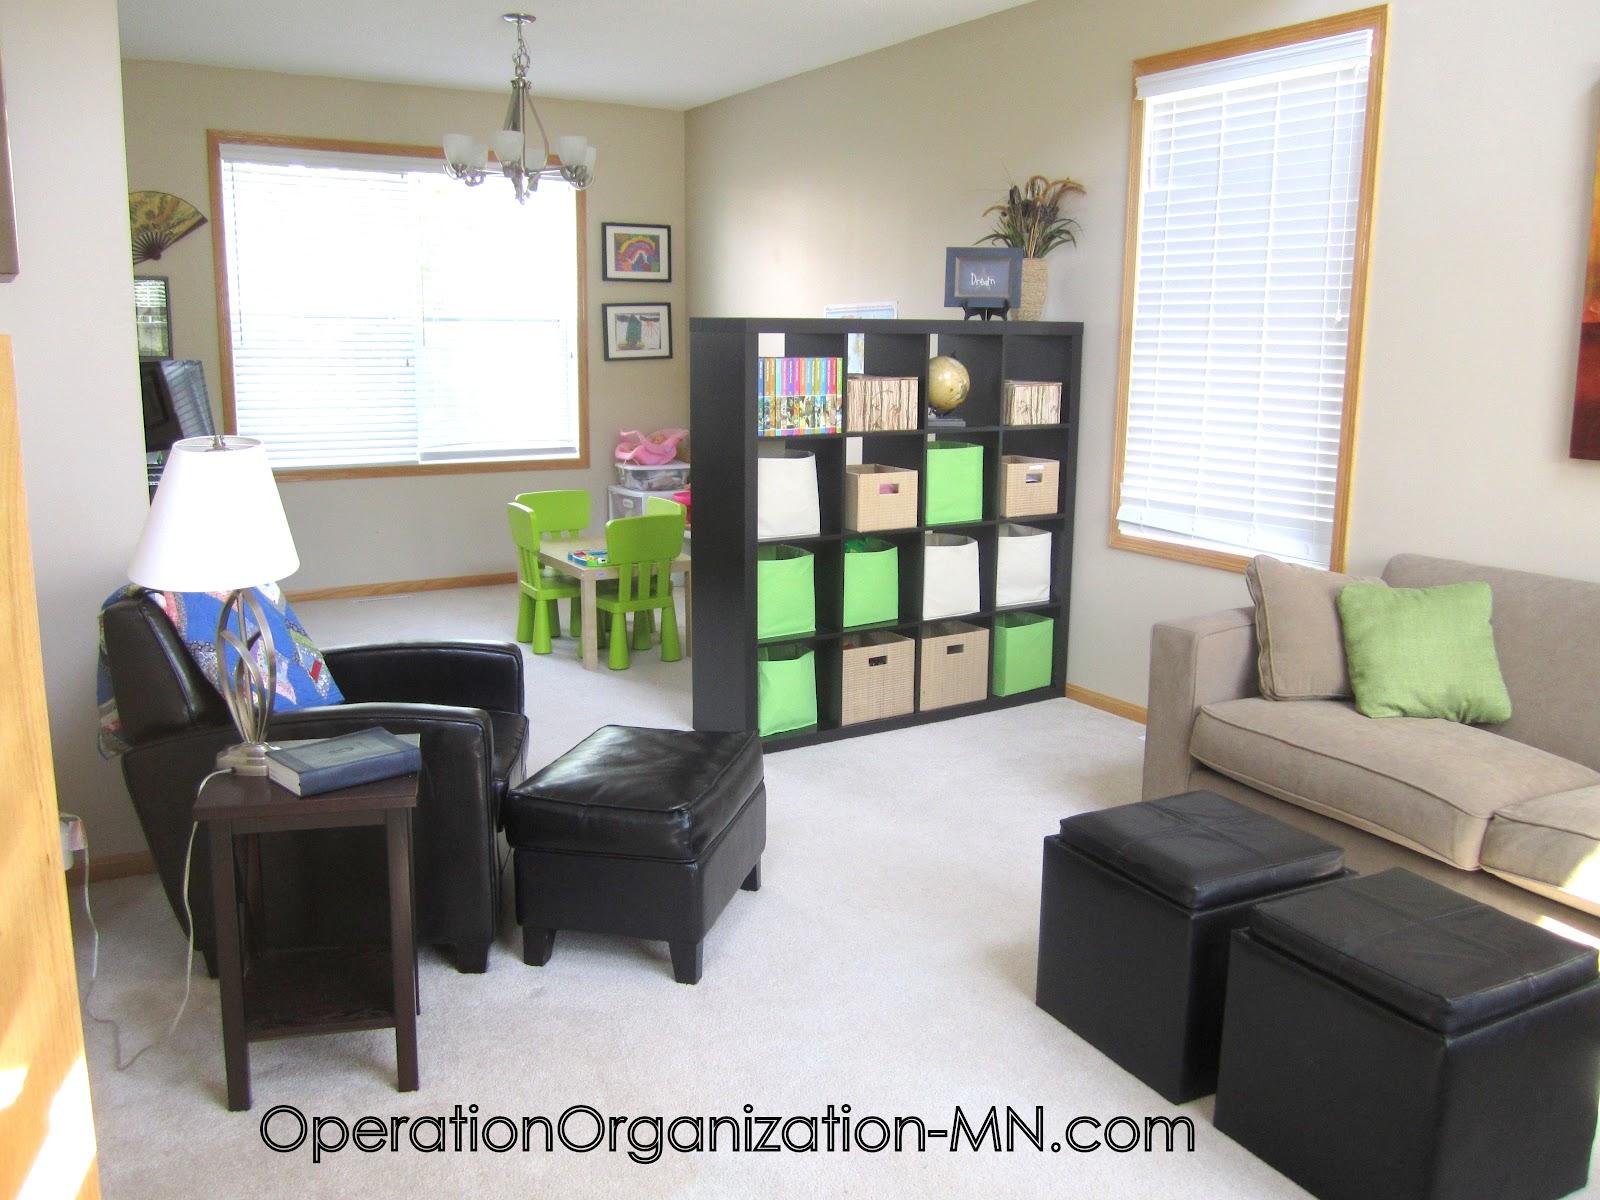 Operation Organization Professional Organizer Peachtree City